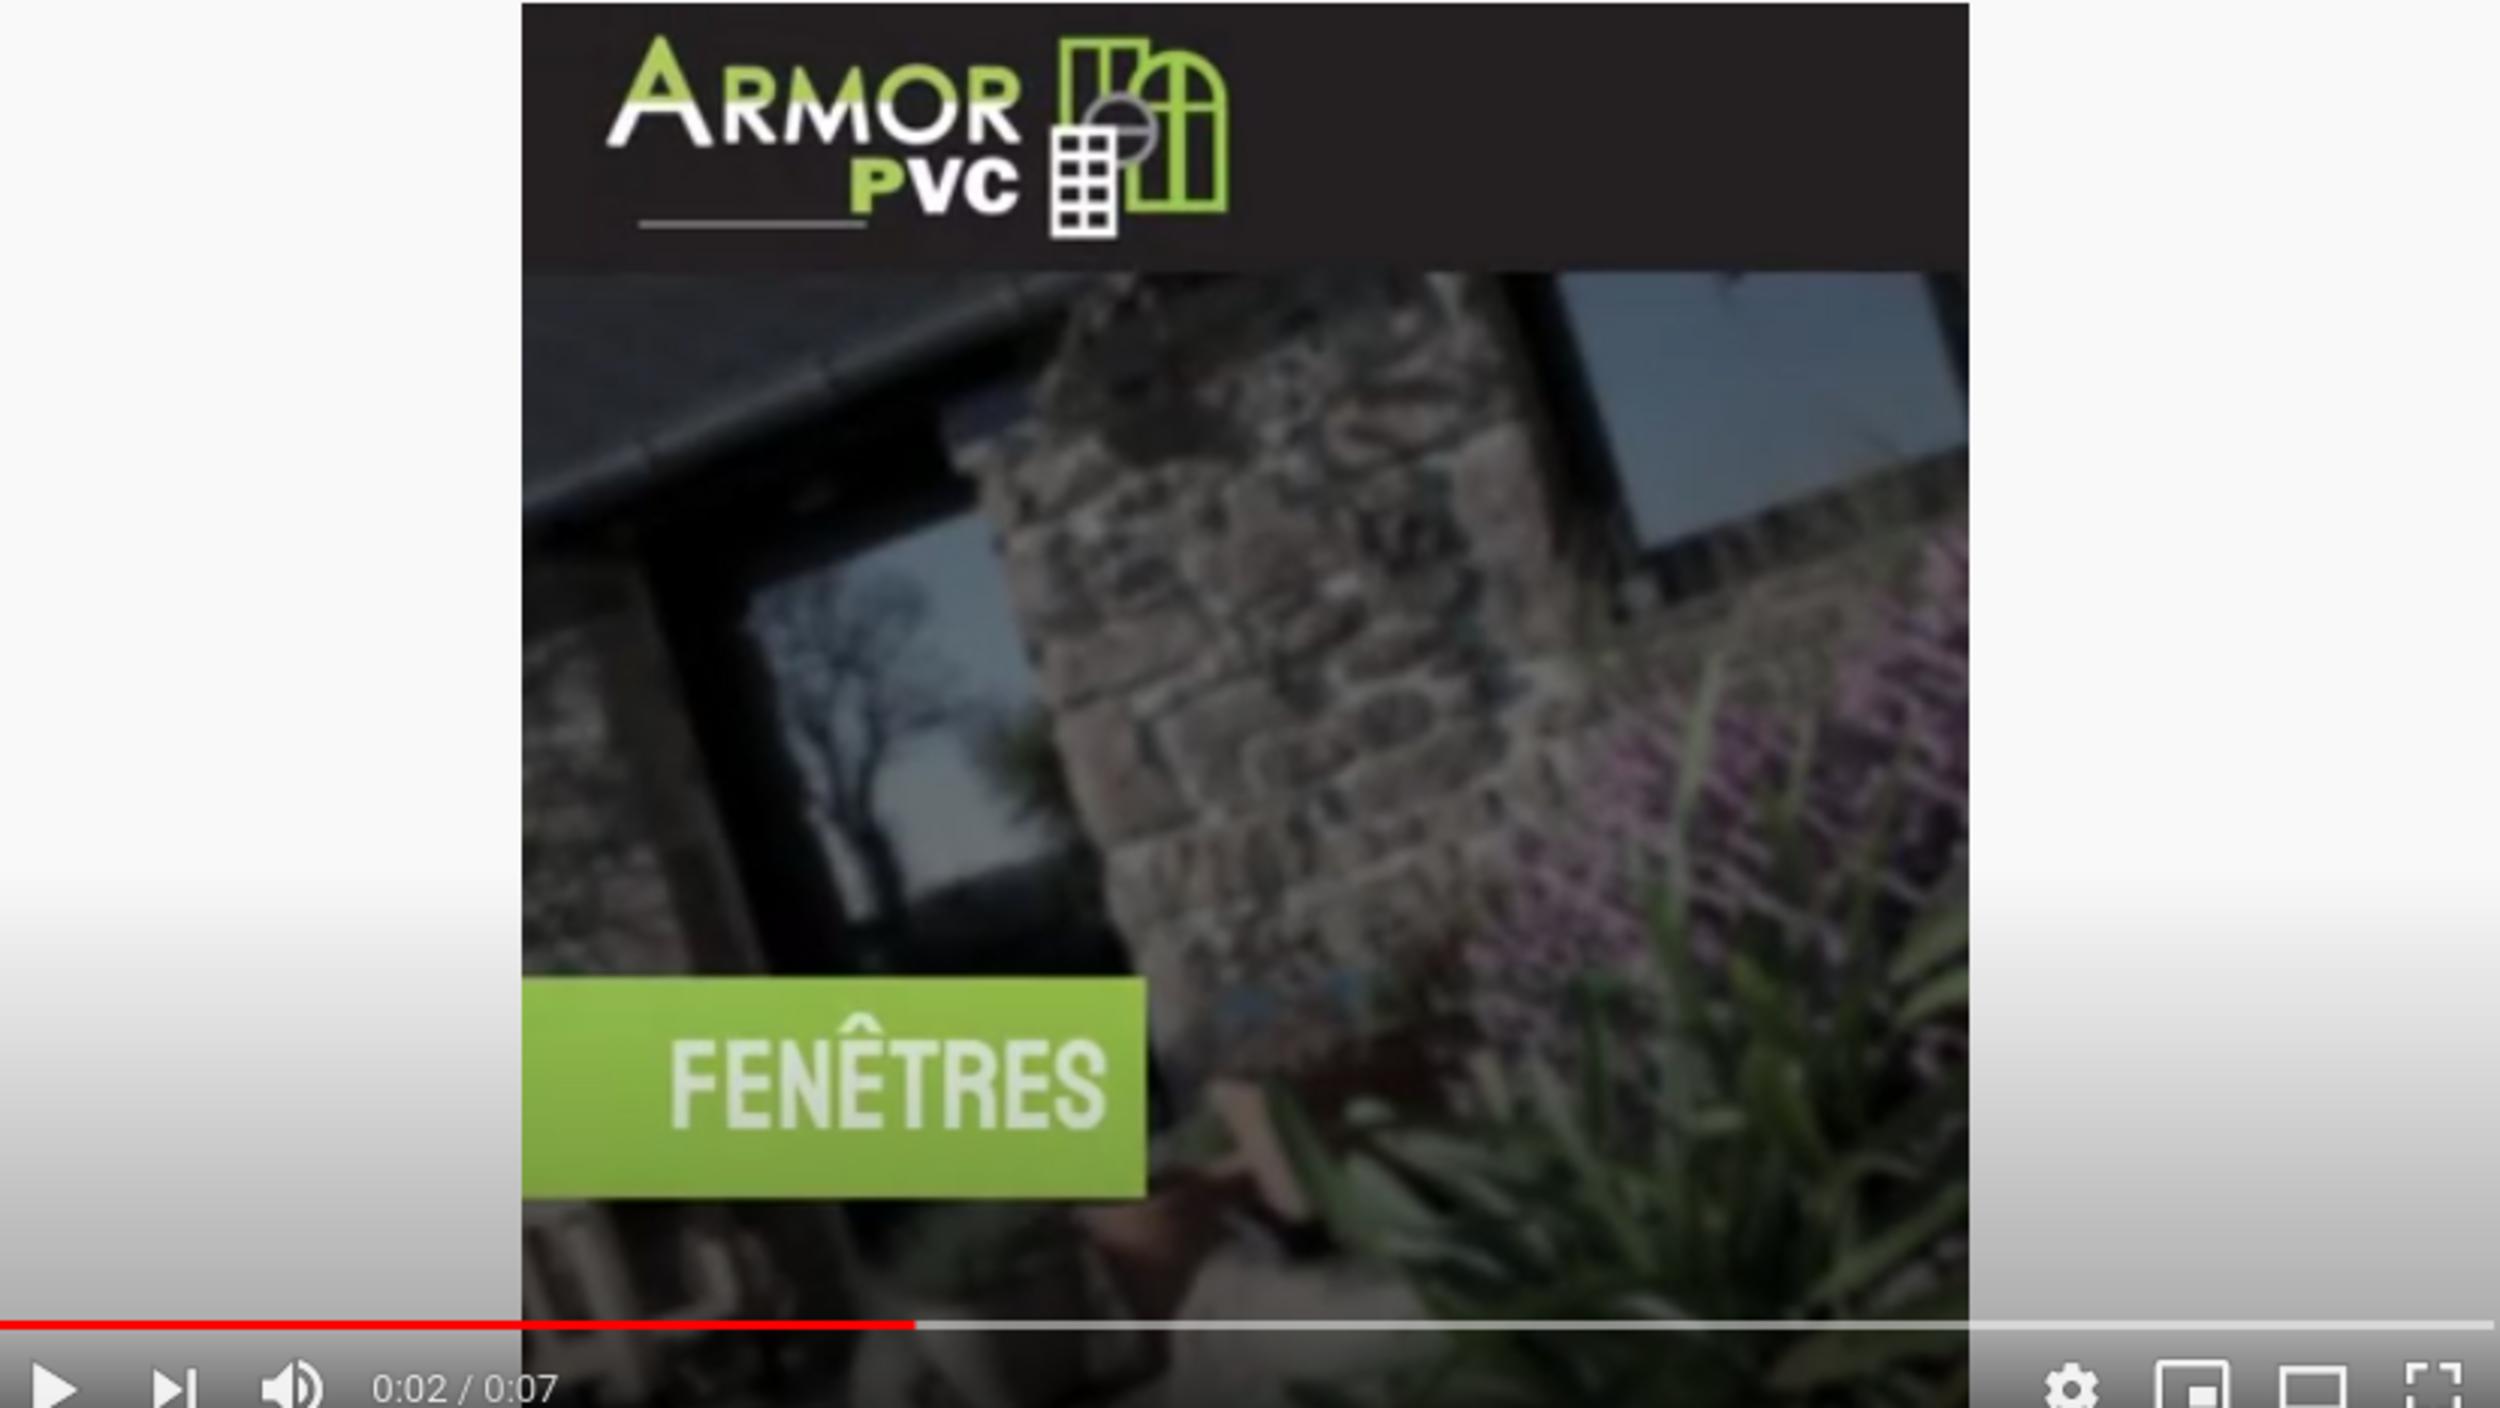 Armor PVC Fenêtres